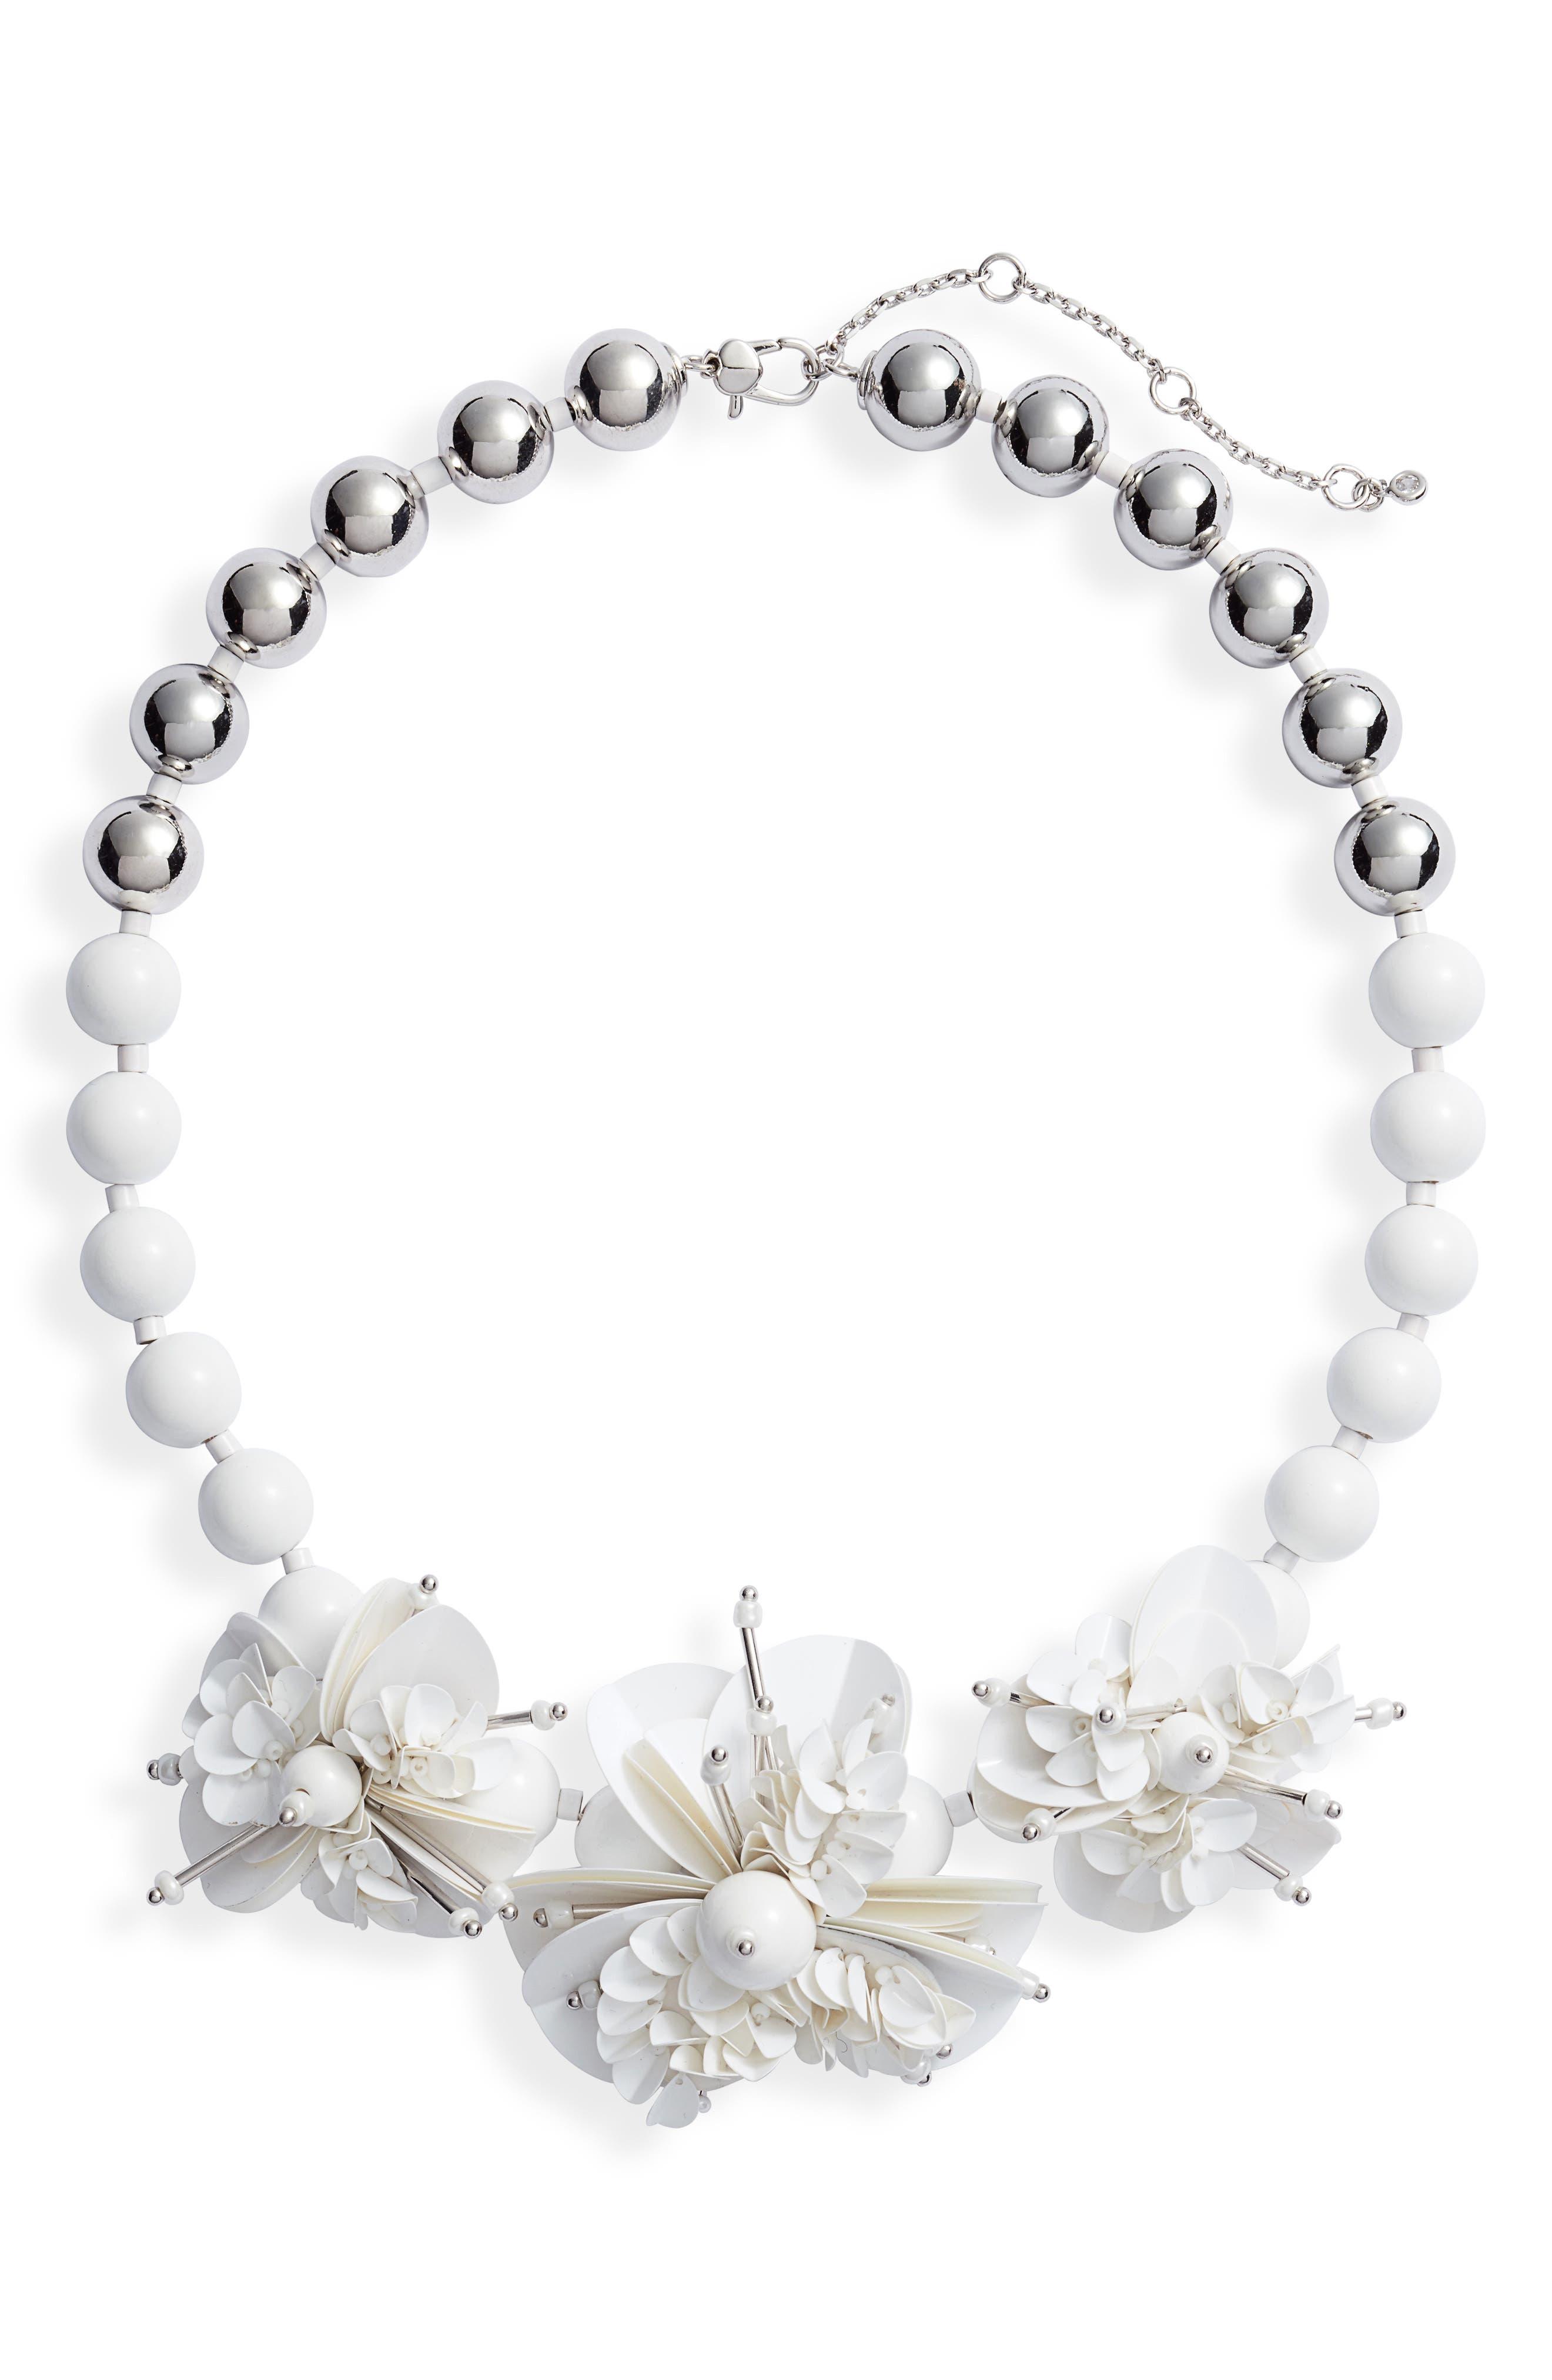 KATE SPADE NEW YORK,                             vibrant life statement necklace,                             Main thumbnail 1, color,                             WHITE MULTI